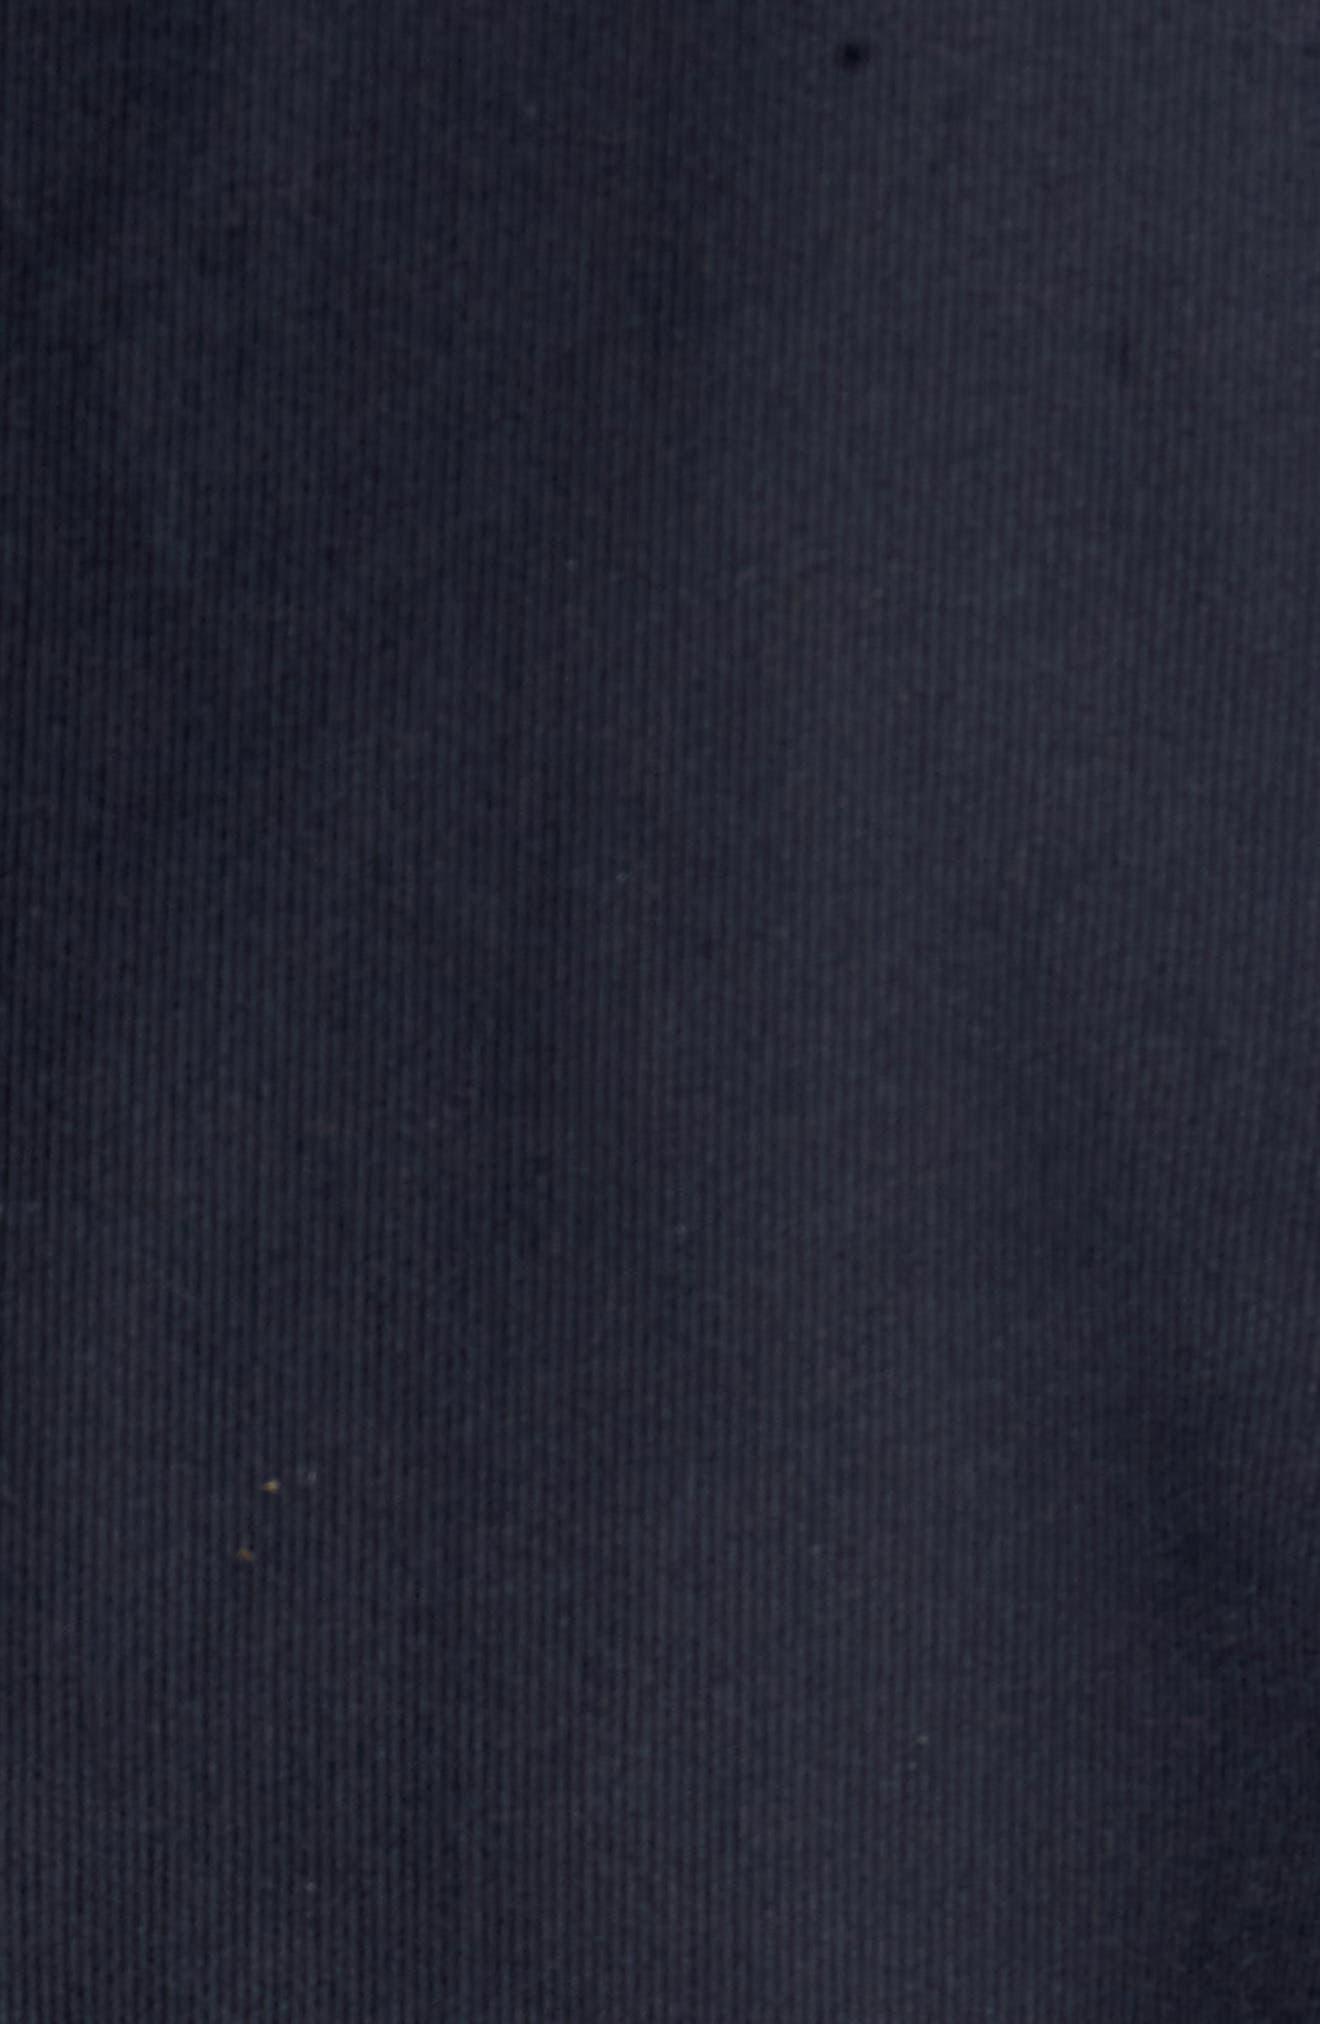 Bedford Corduroy Goose Down Jacket with Faux Fur Trim,                             Alternate thumbnail 5, color,                             Navy